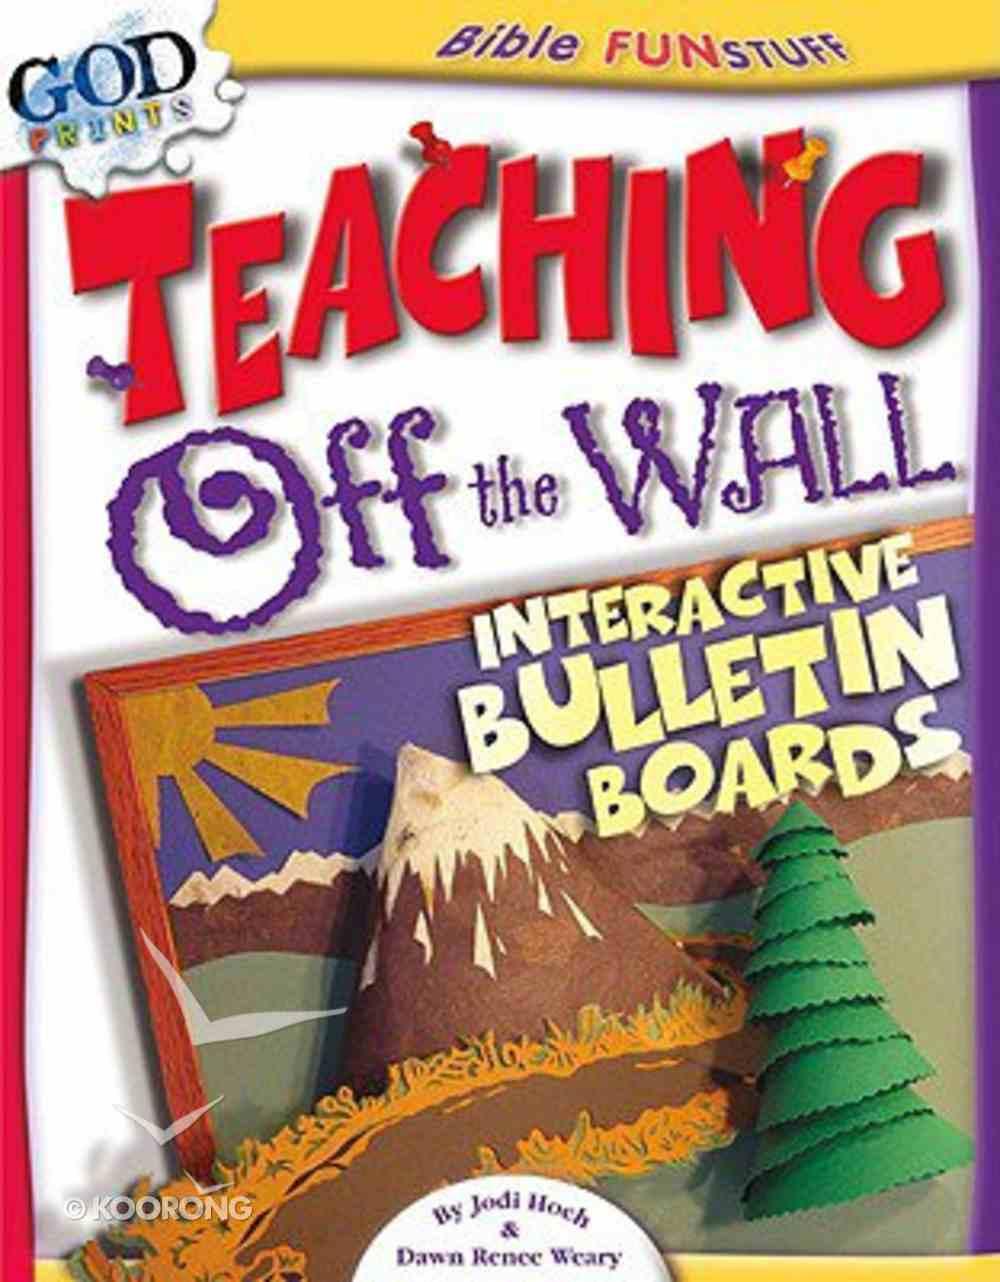 Teaching Off the Wall (Godprints Bible Fun Stuff Series) Paperback